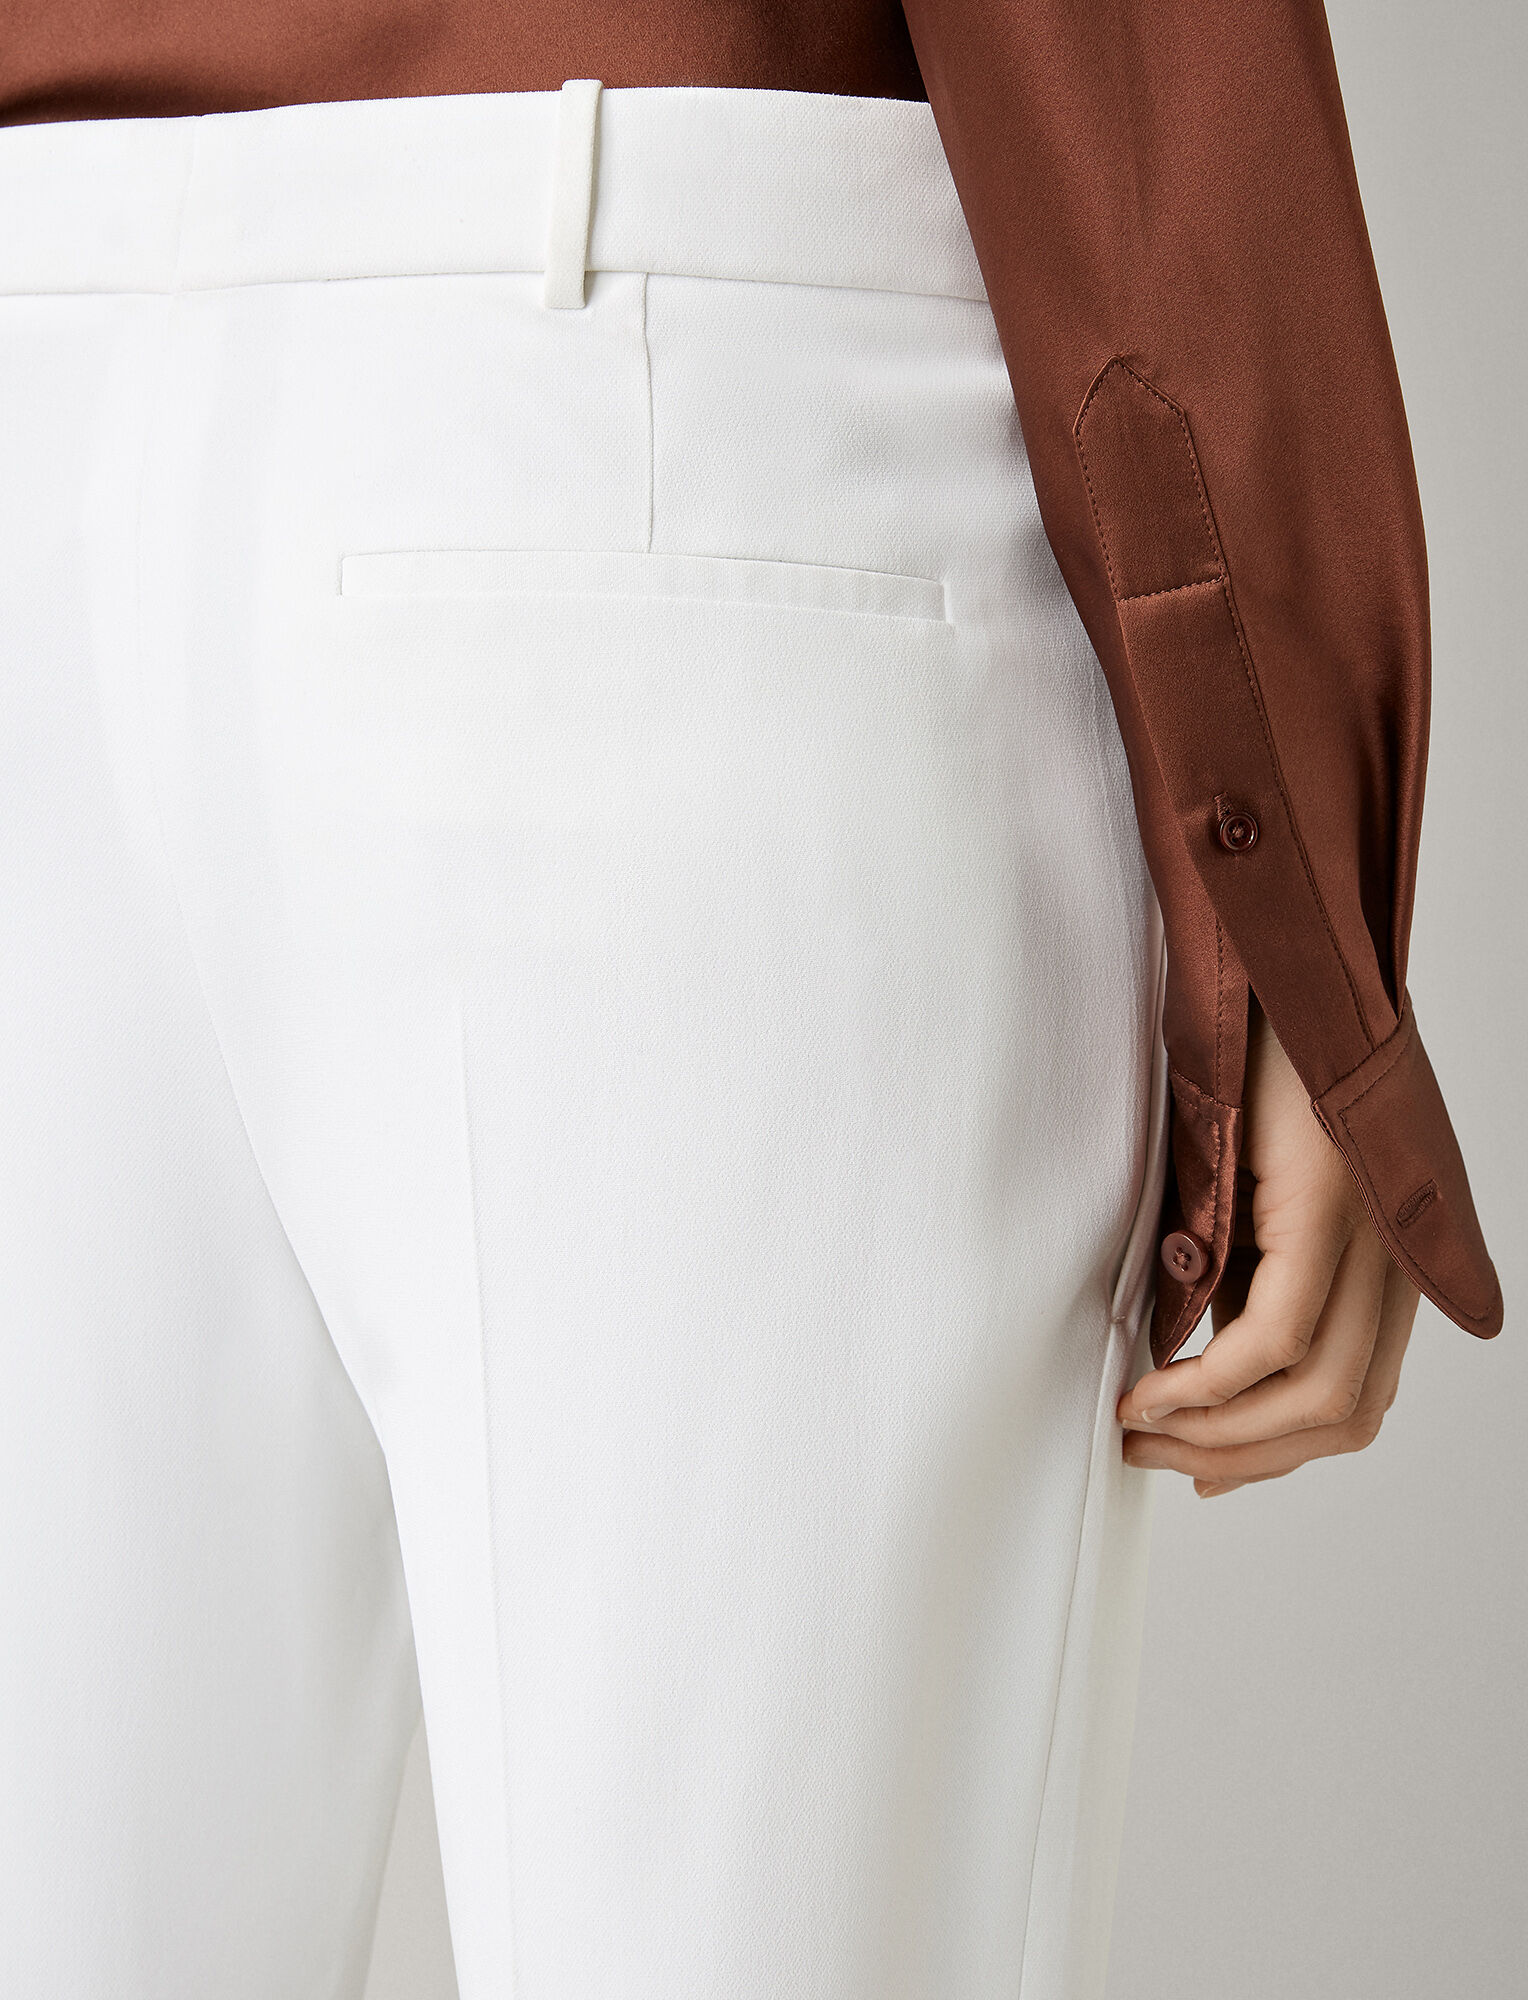 Joseph, Coman Stretch Acetate Viscose Trousers, in WHITE